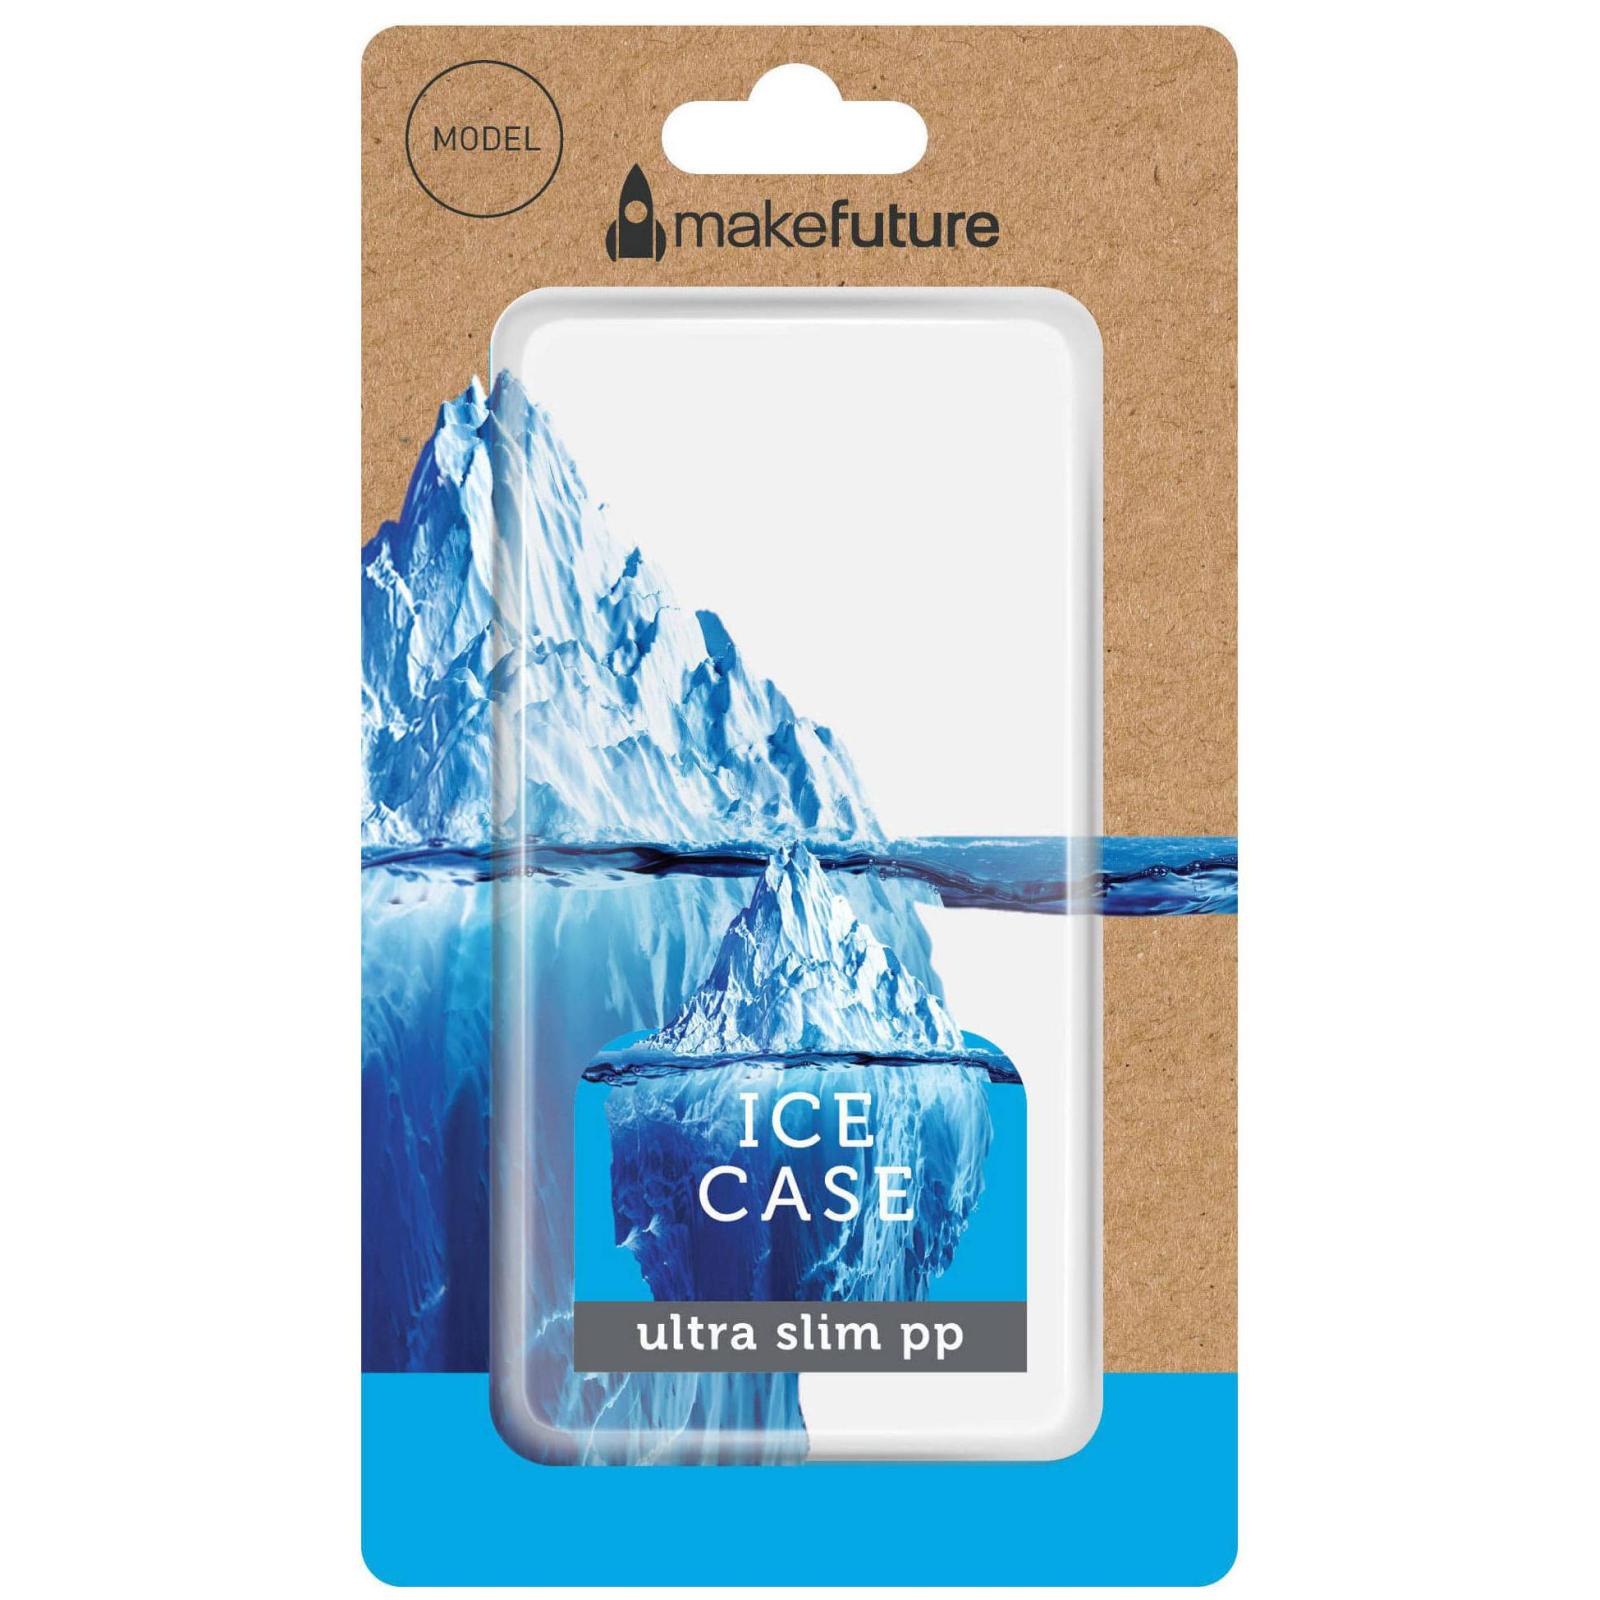 Чехол для моб. телефона MakeFuture Ice Case (PP) Apple iPhone 8 Plus White (MCI-AI8PWH) изображение 4